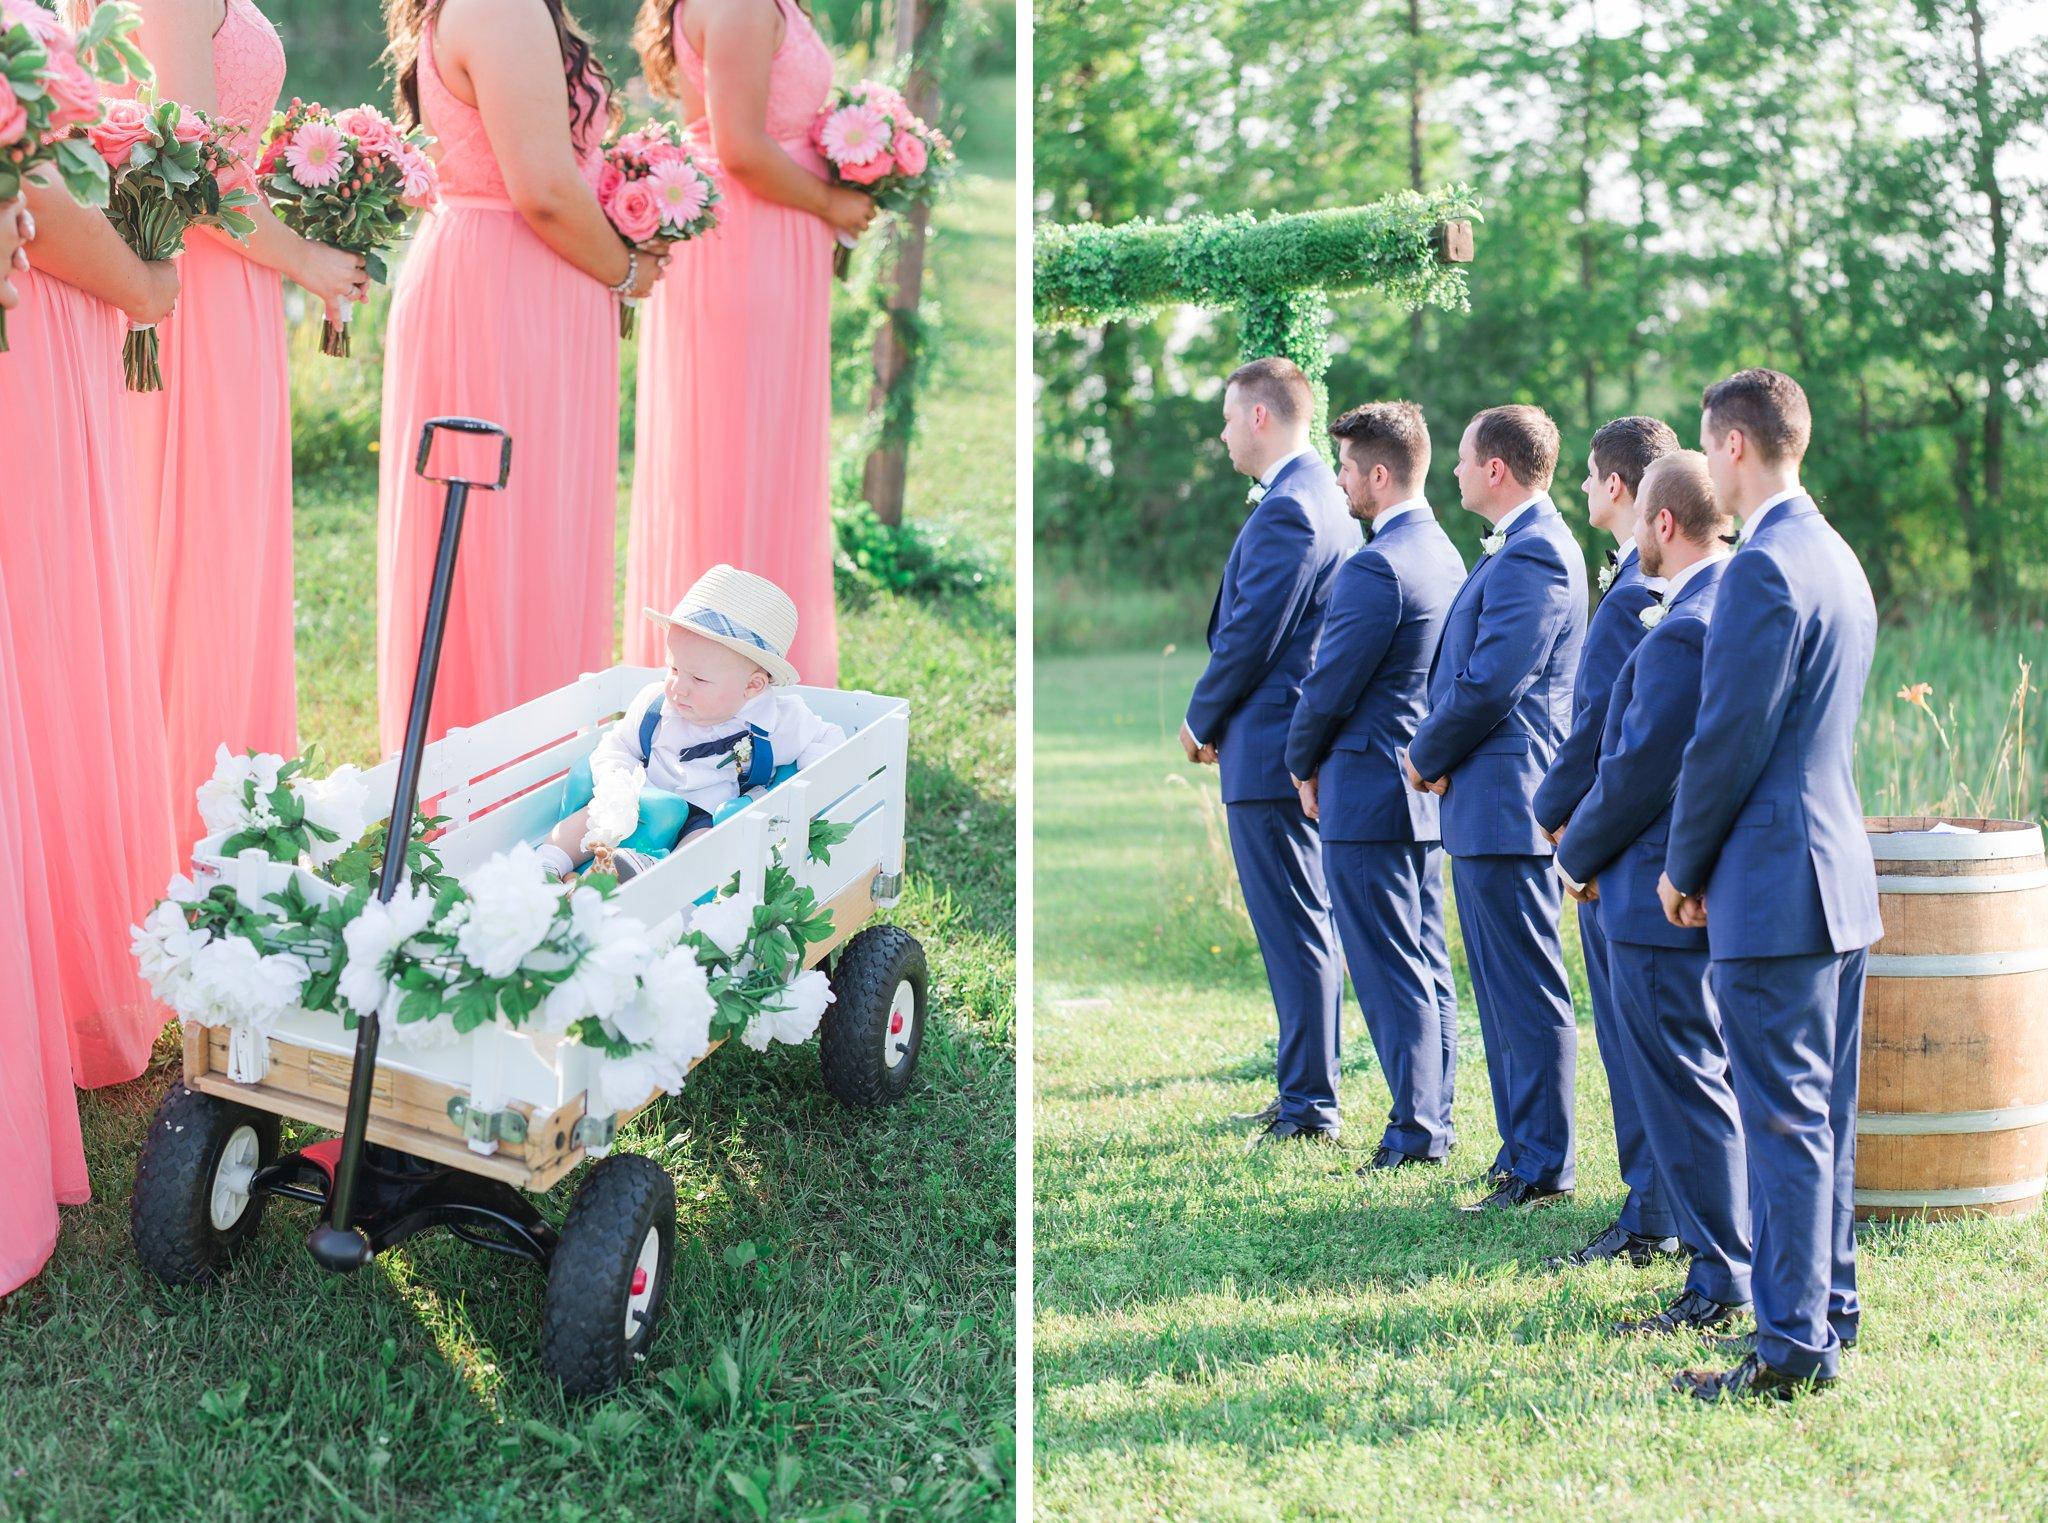 Just wait t'ill you see mommy wagon Vineyard wedding at Jabulani Amy Pinder Photography